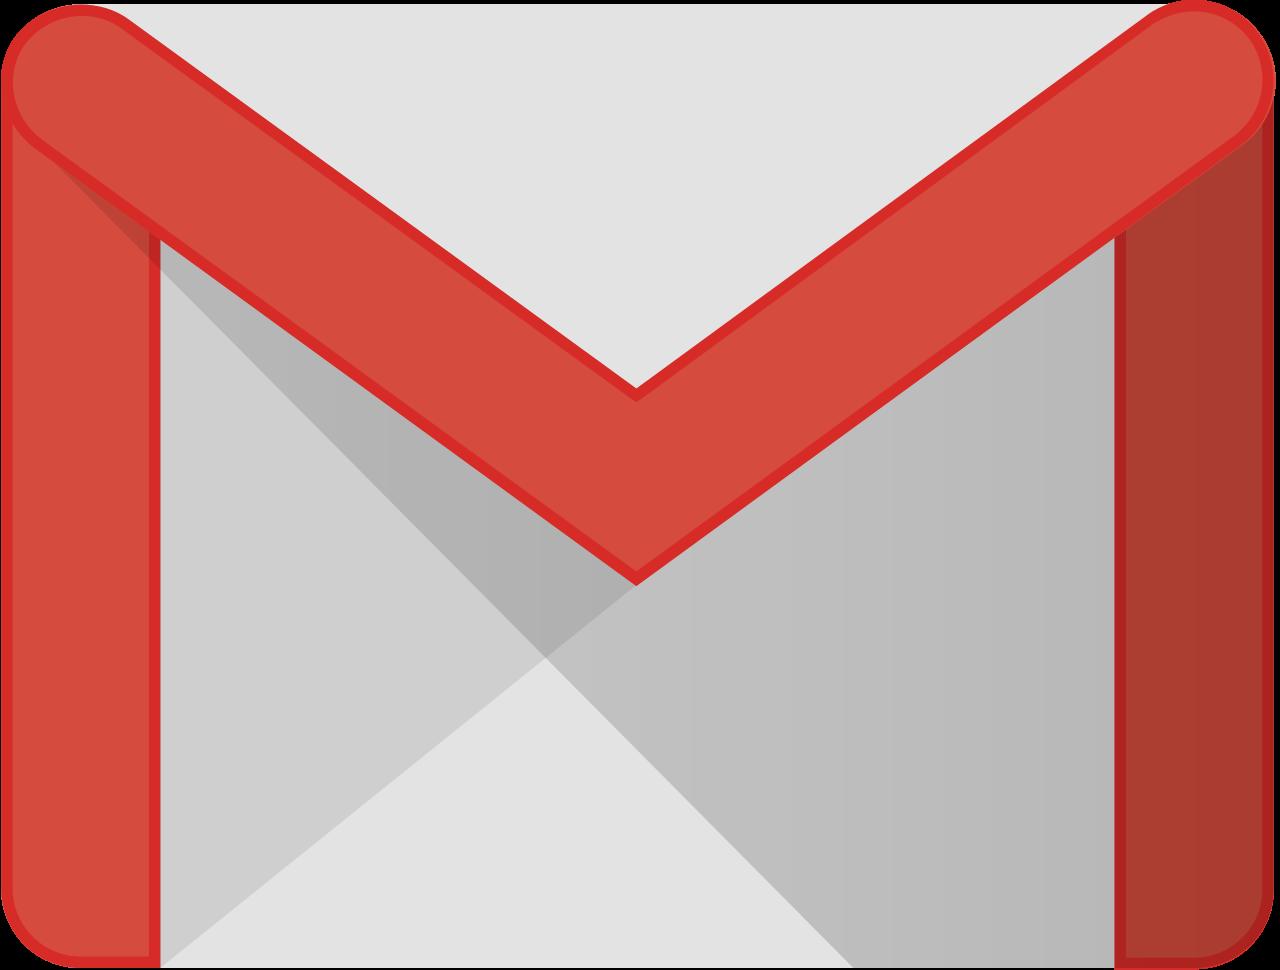 https://www.erekibeon.com/blog/wp-content/uploads/2016/07/gmail-logo-6